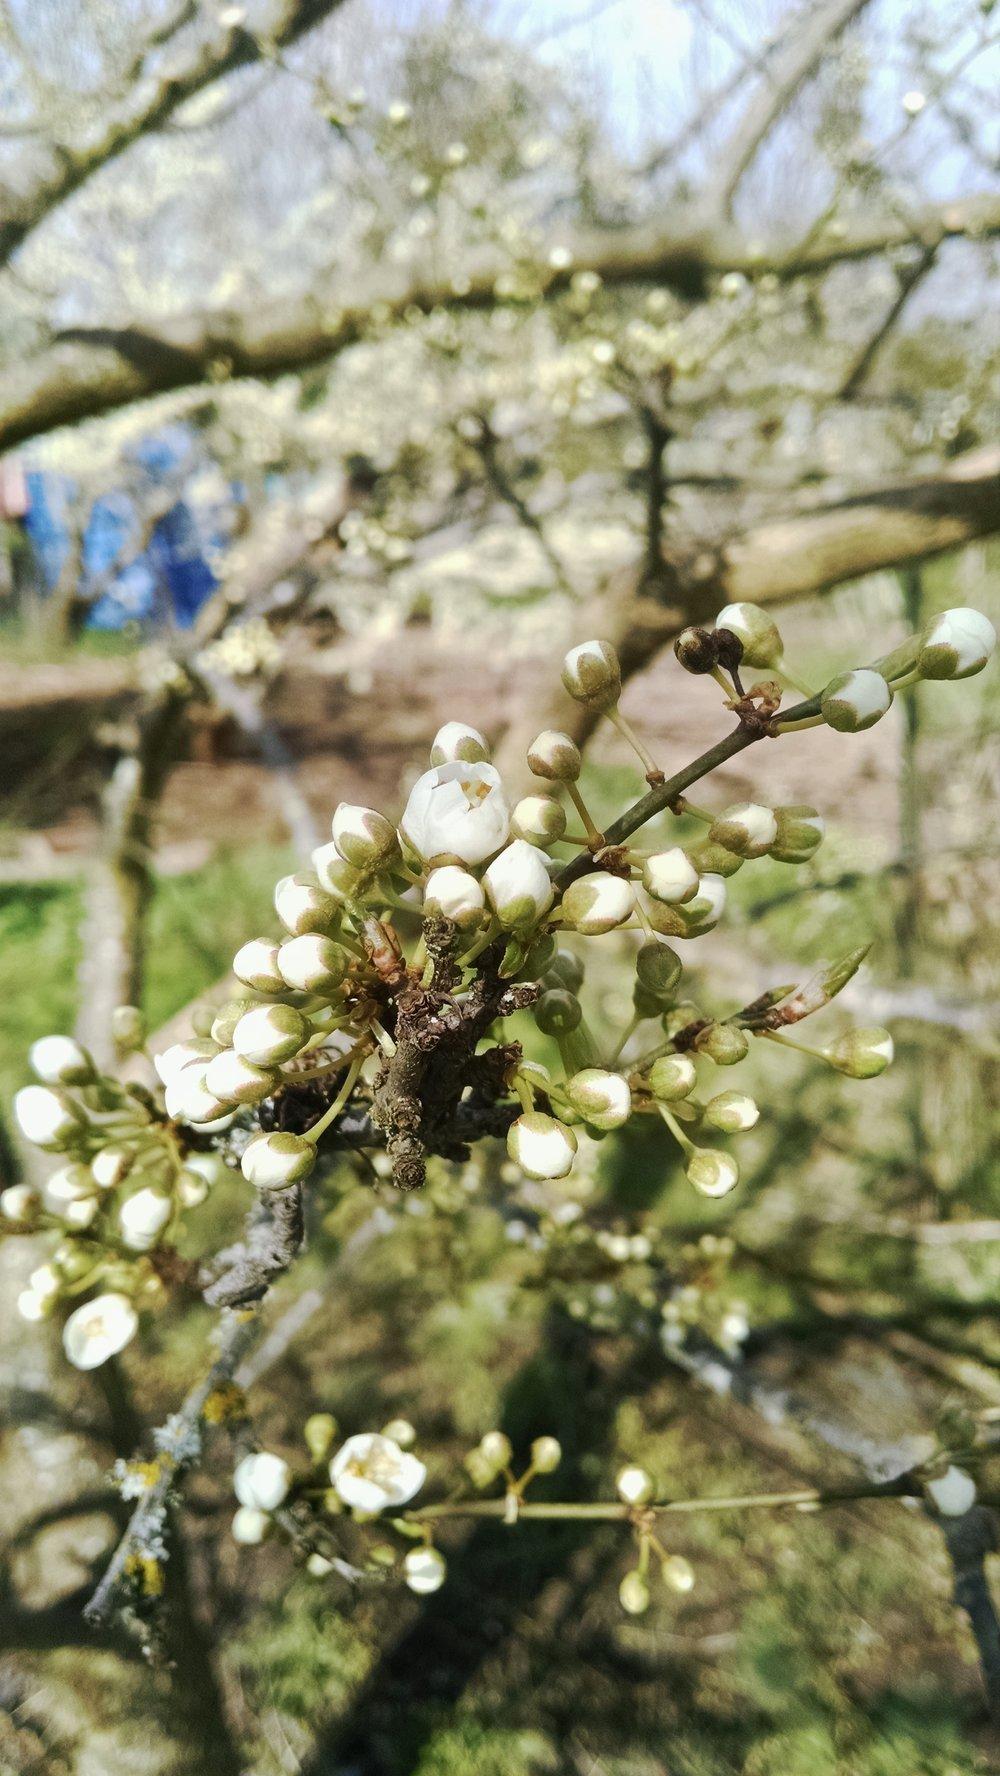 Plum blossoms breaking